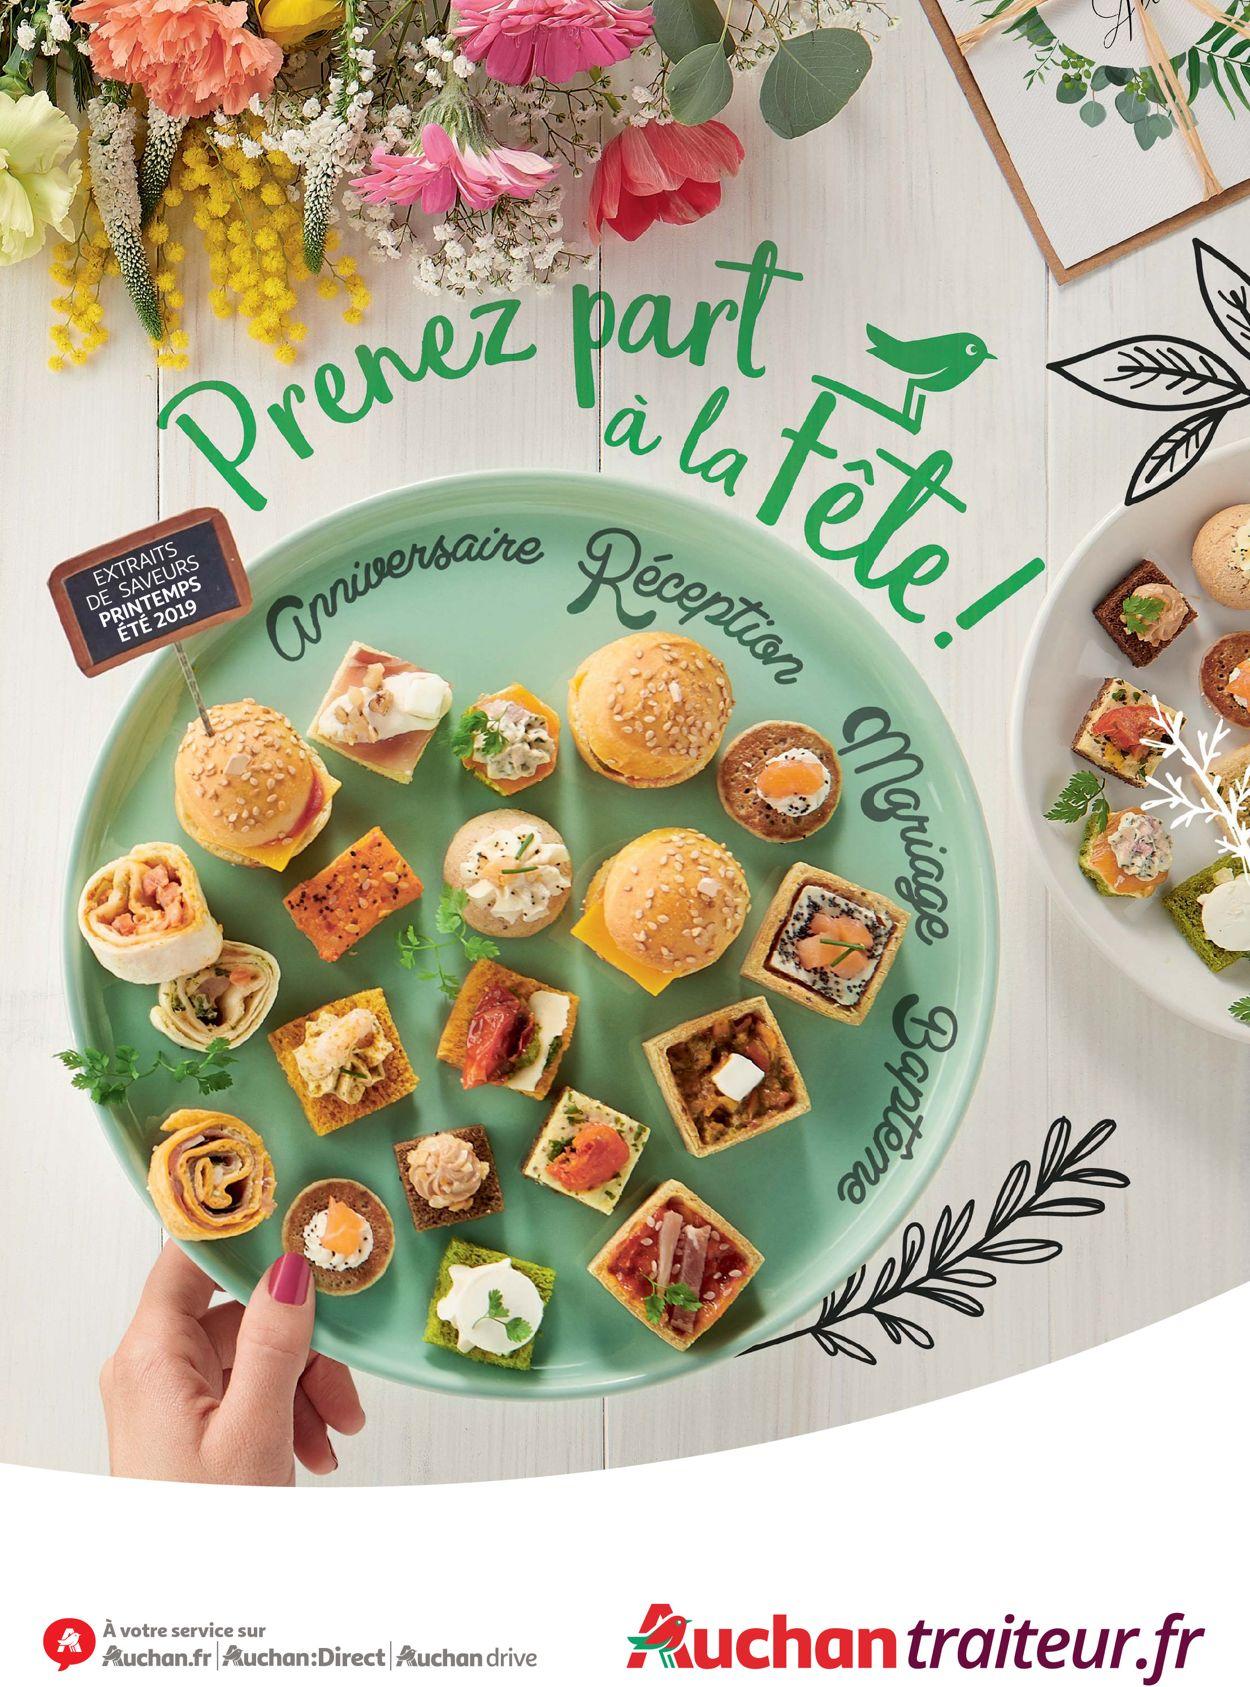 Auchan Catalogue - 01.04-30.09.2019